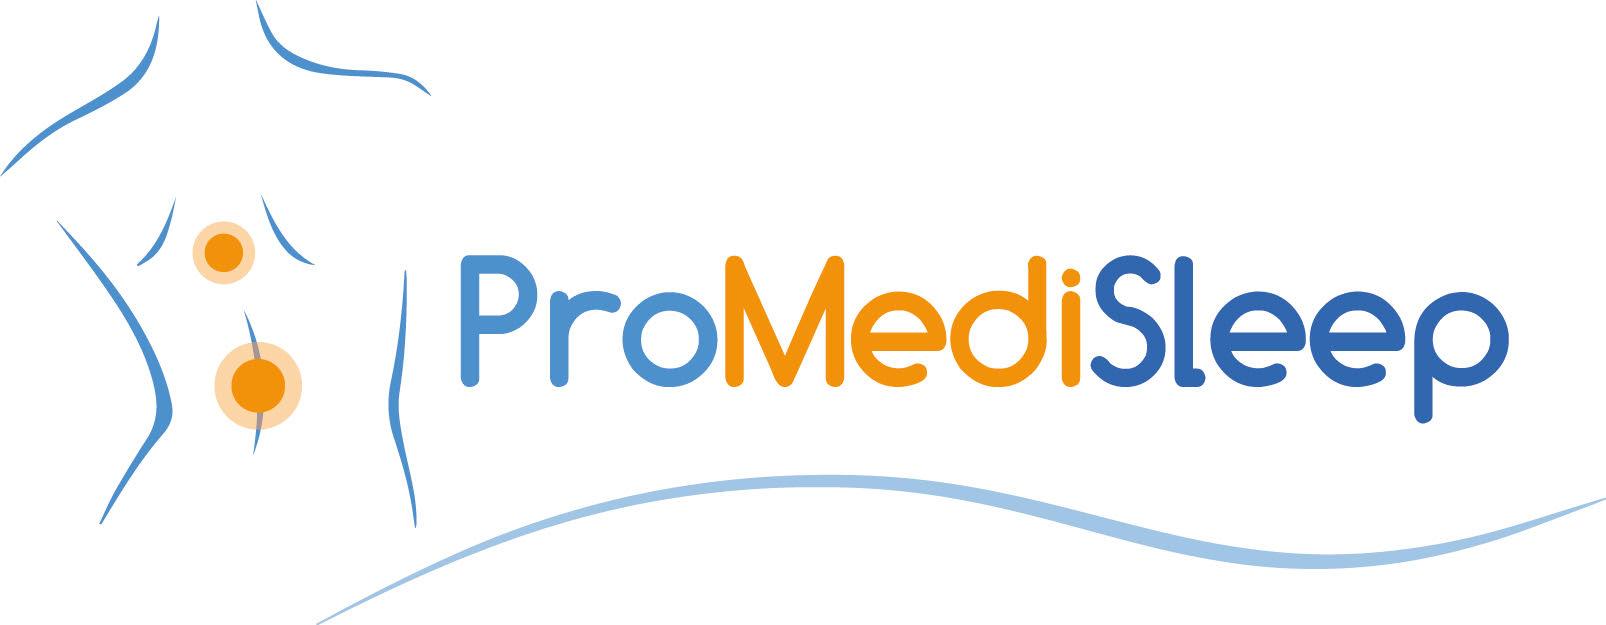 Promedisleep